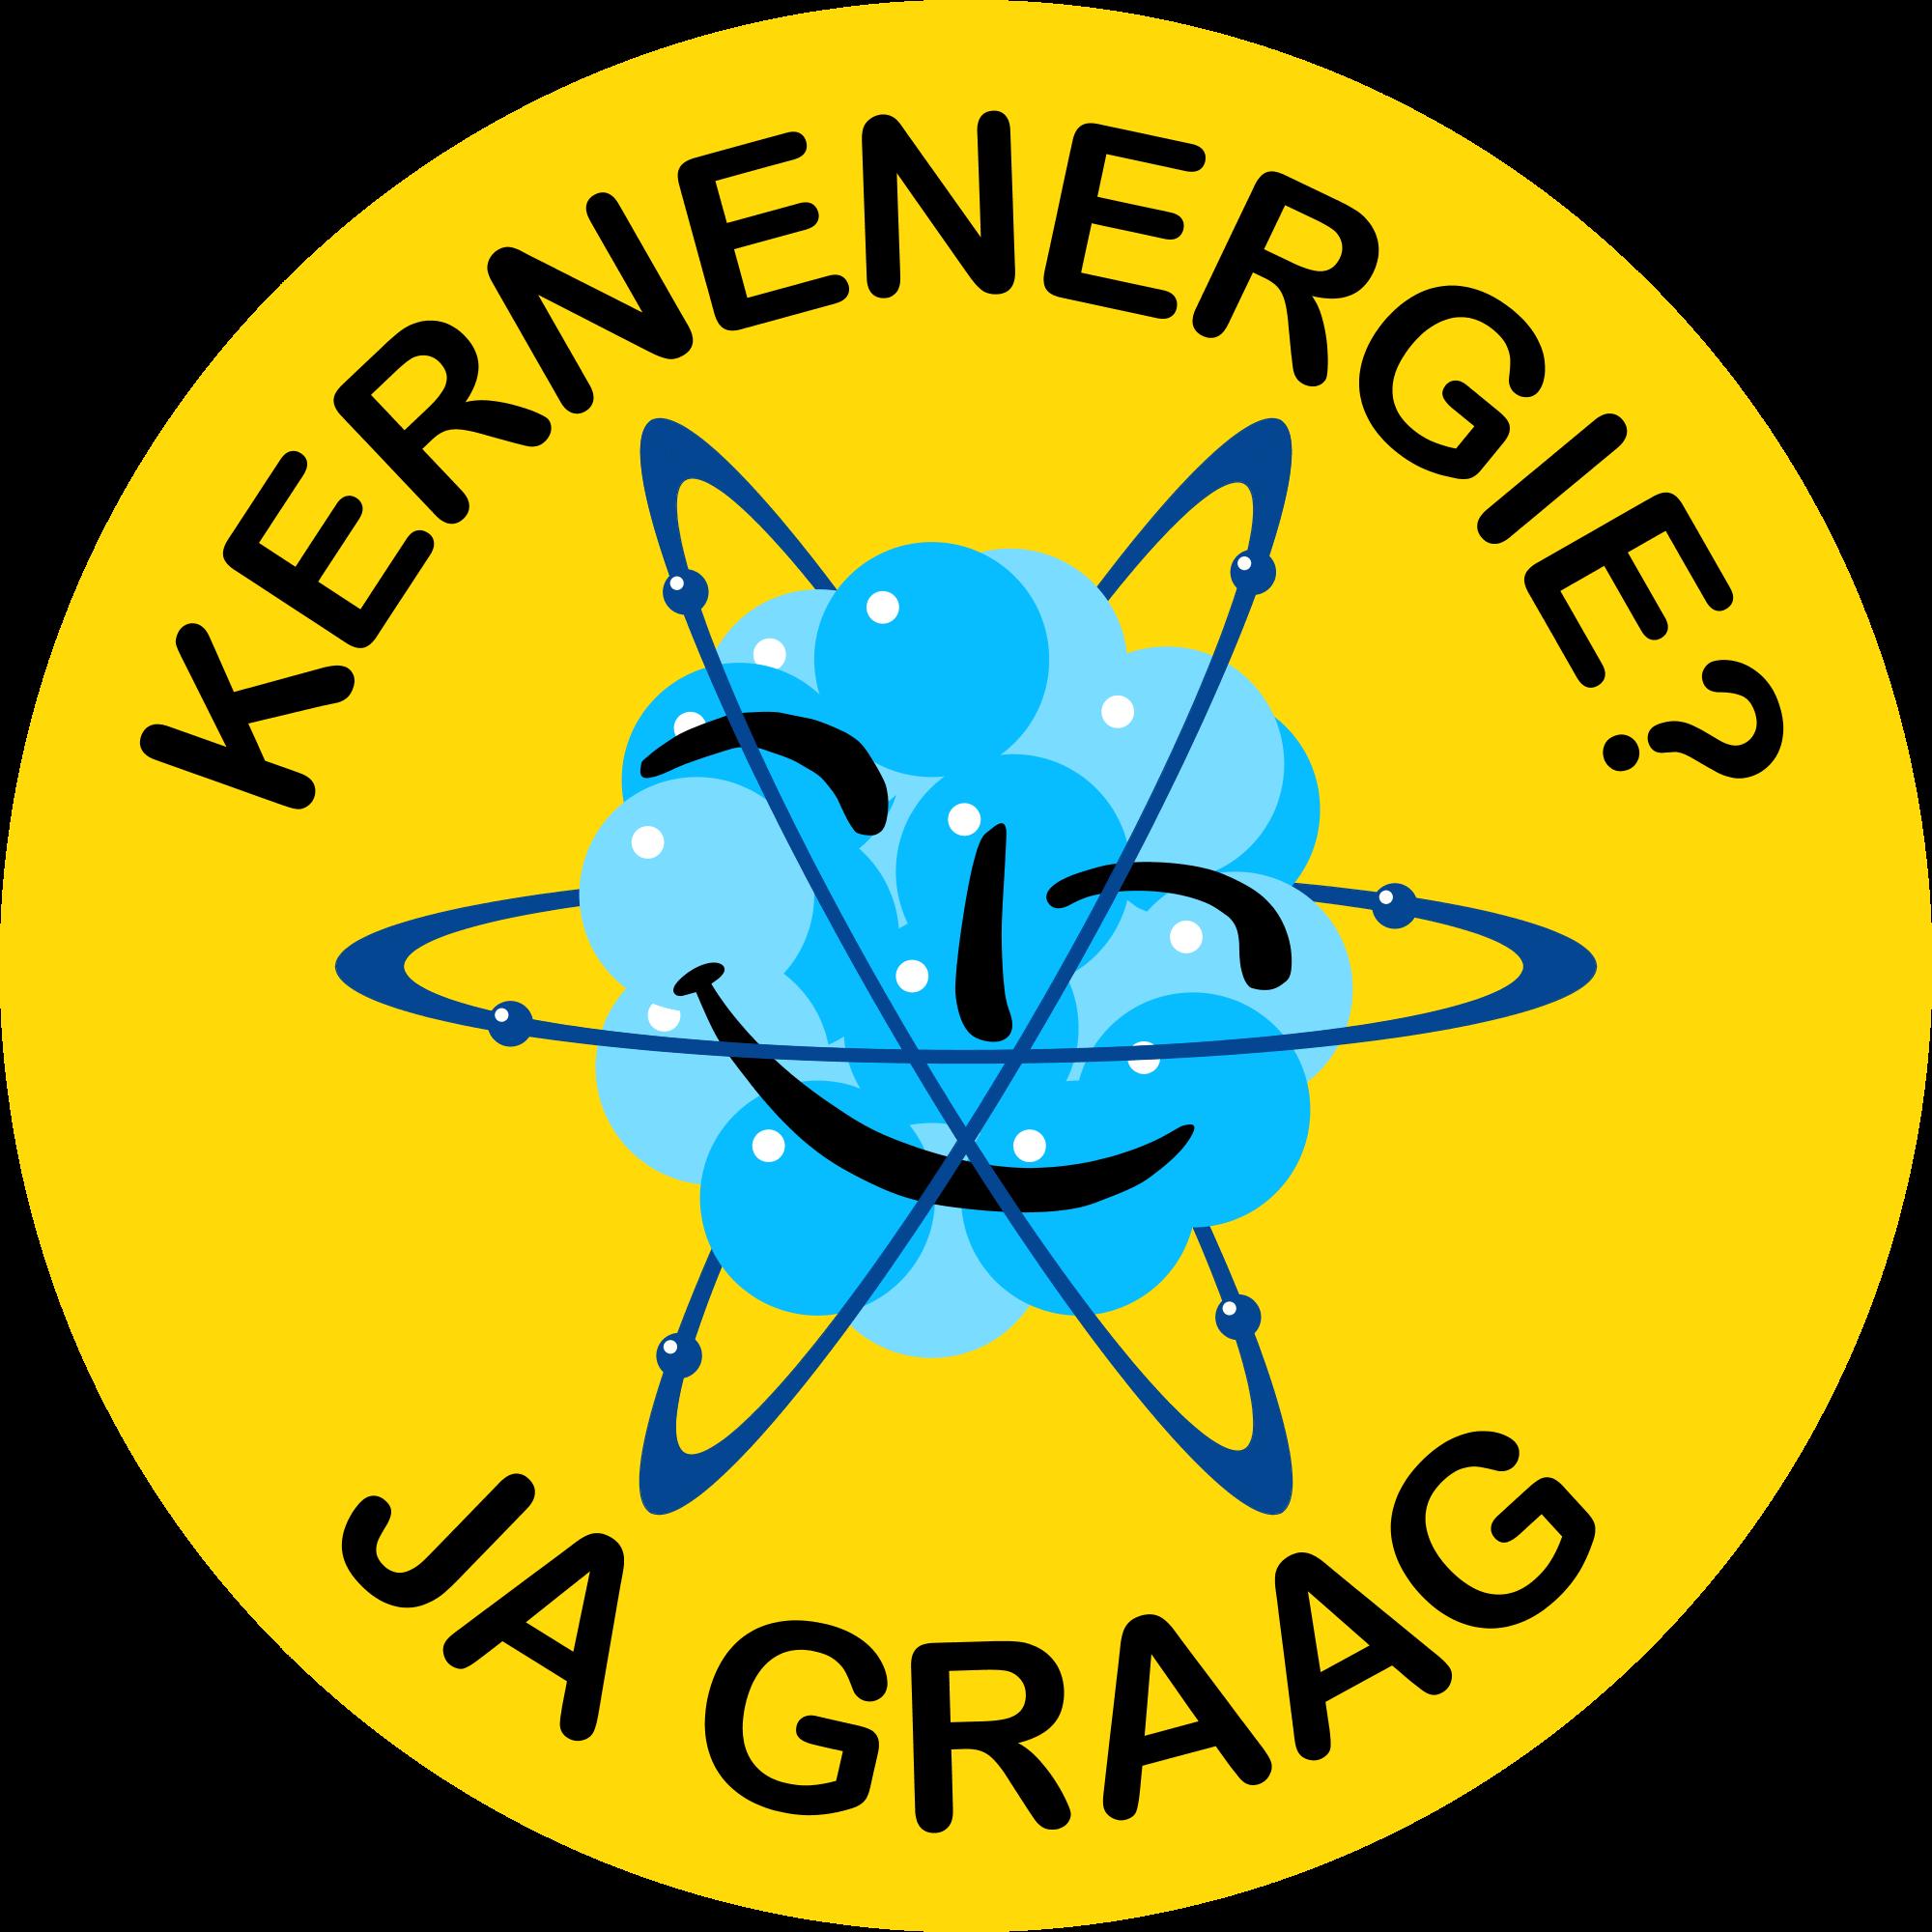 http://vignette3.wikia.nocookie.net/hoax/images/0/07/Kernenergie_Ja_Graag_(2000x2000).png/revision/latest?cb=20151221103946&path-prefix=nl